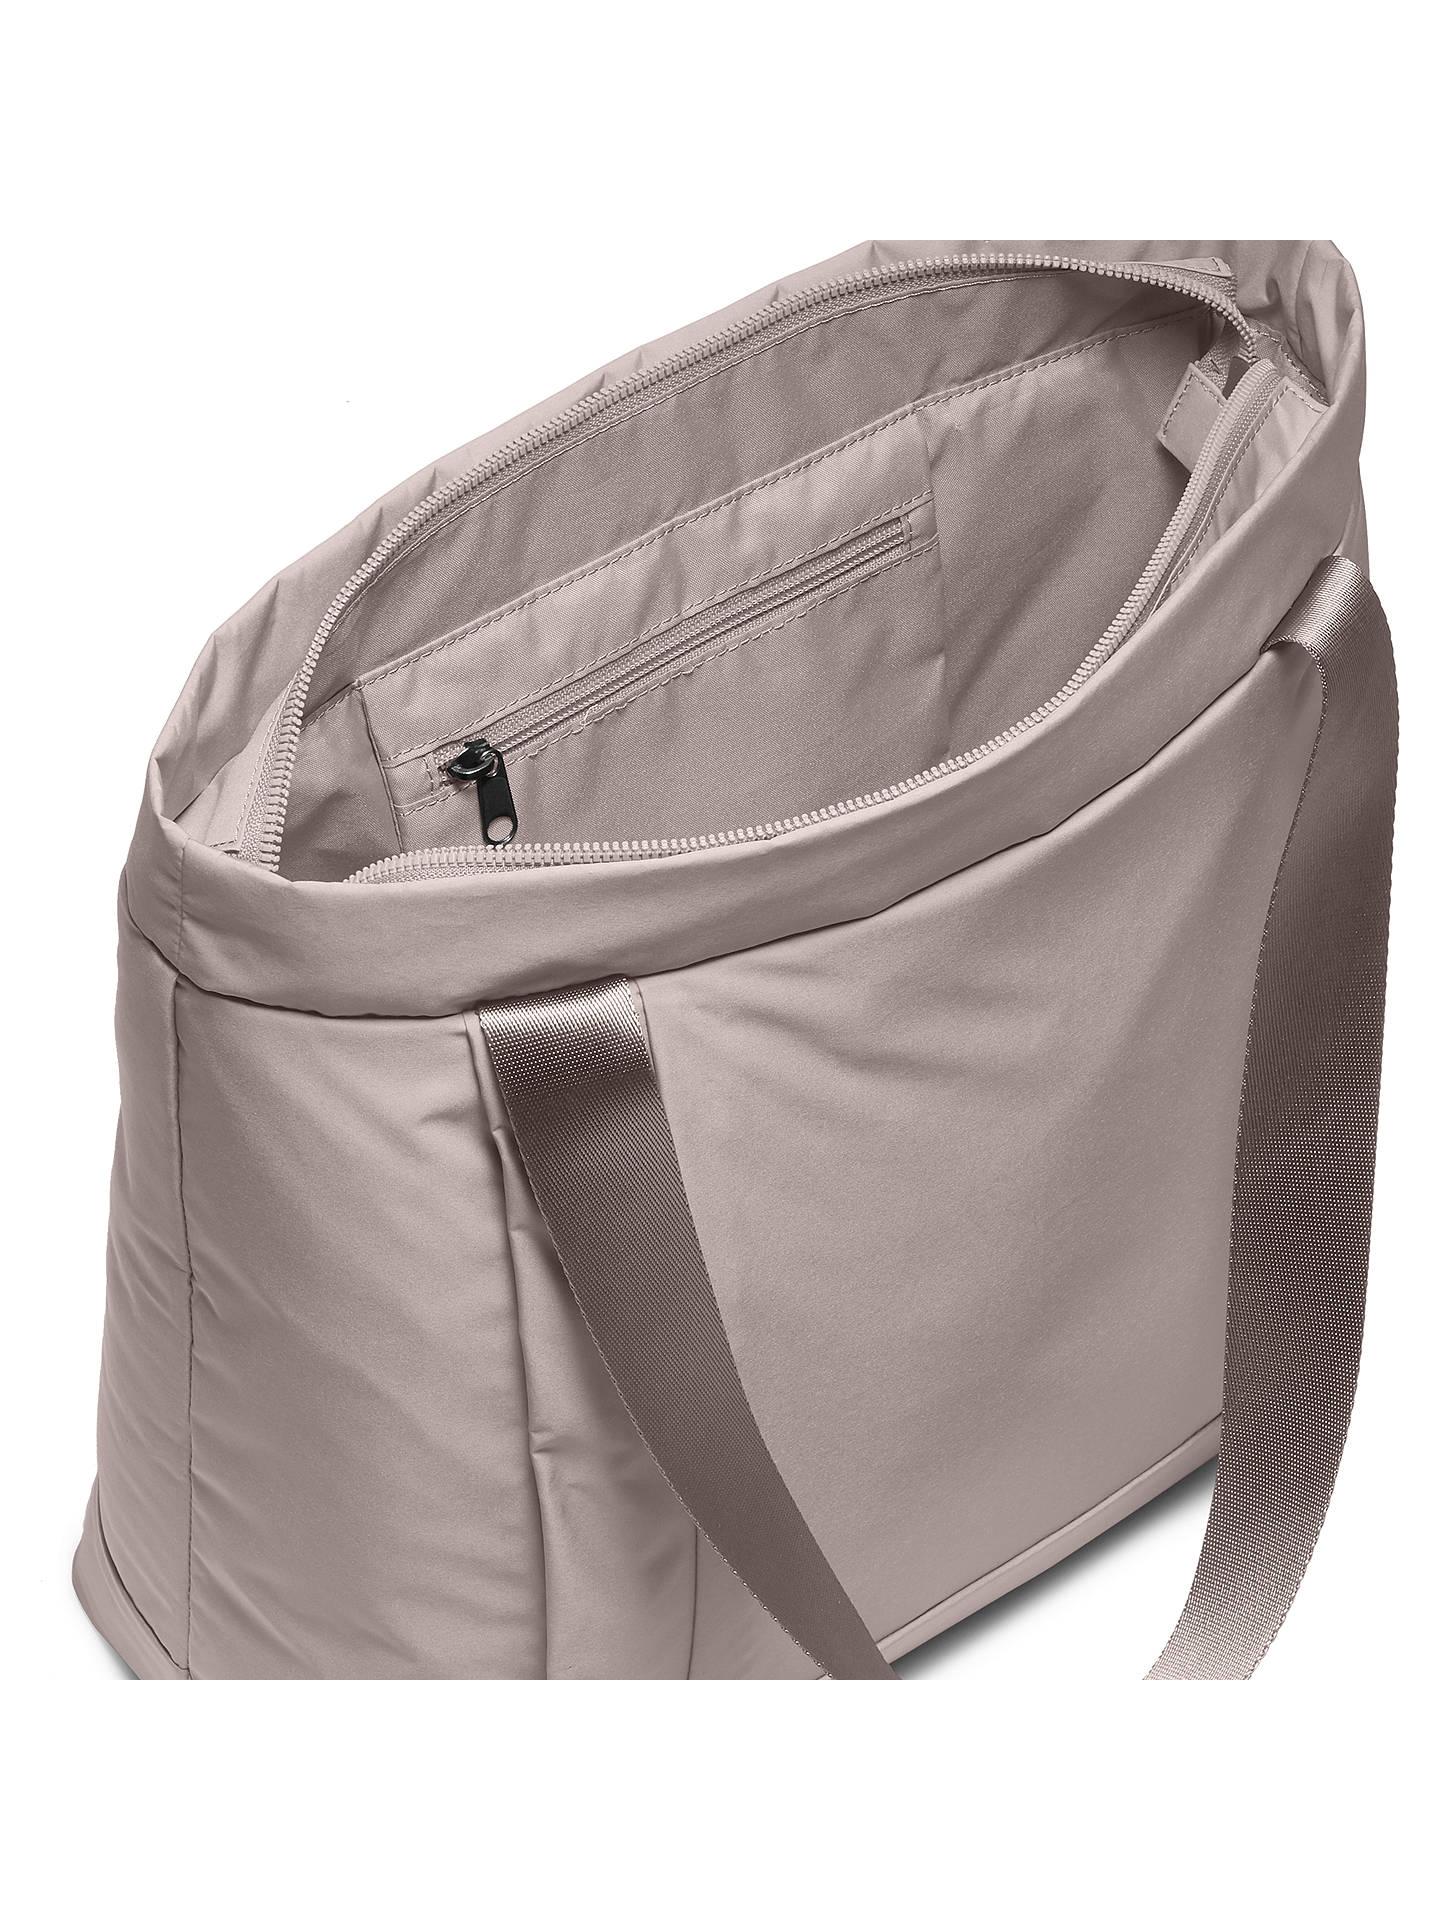 NIKE DUFFEL, GYM, GEAR BAG, PADDED SHOULDER STRAP/HANDLE ... |Nike Dry Bag